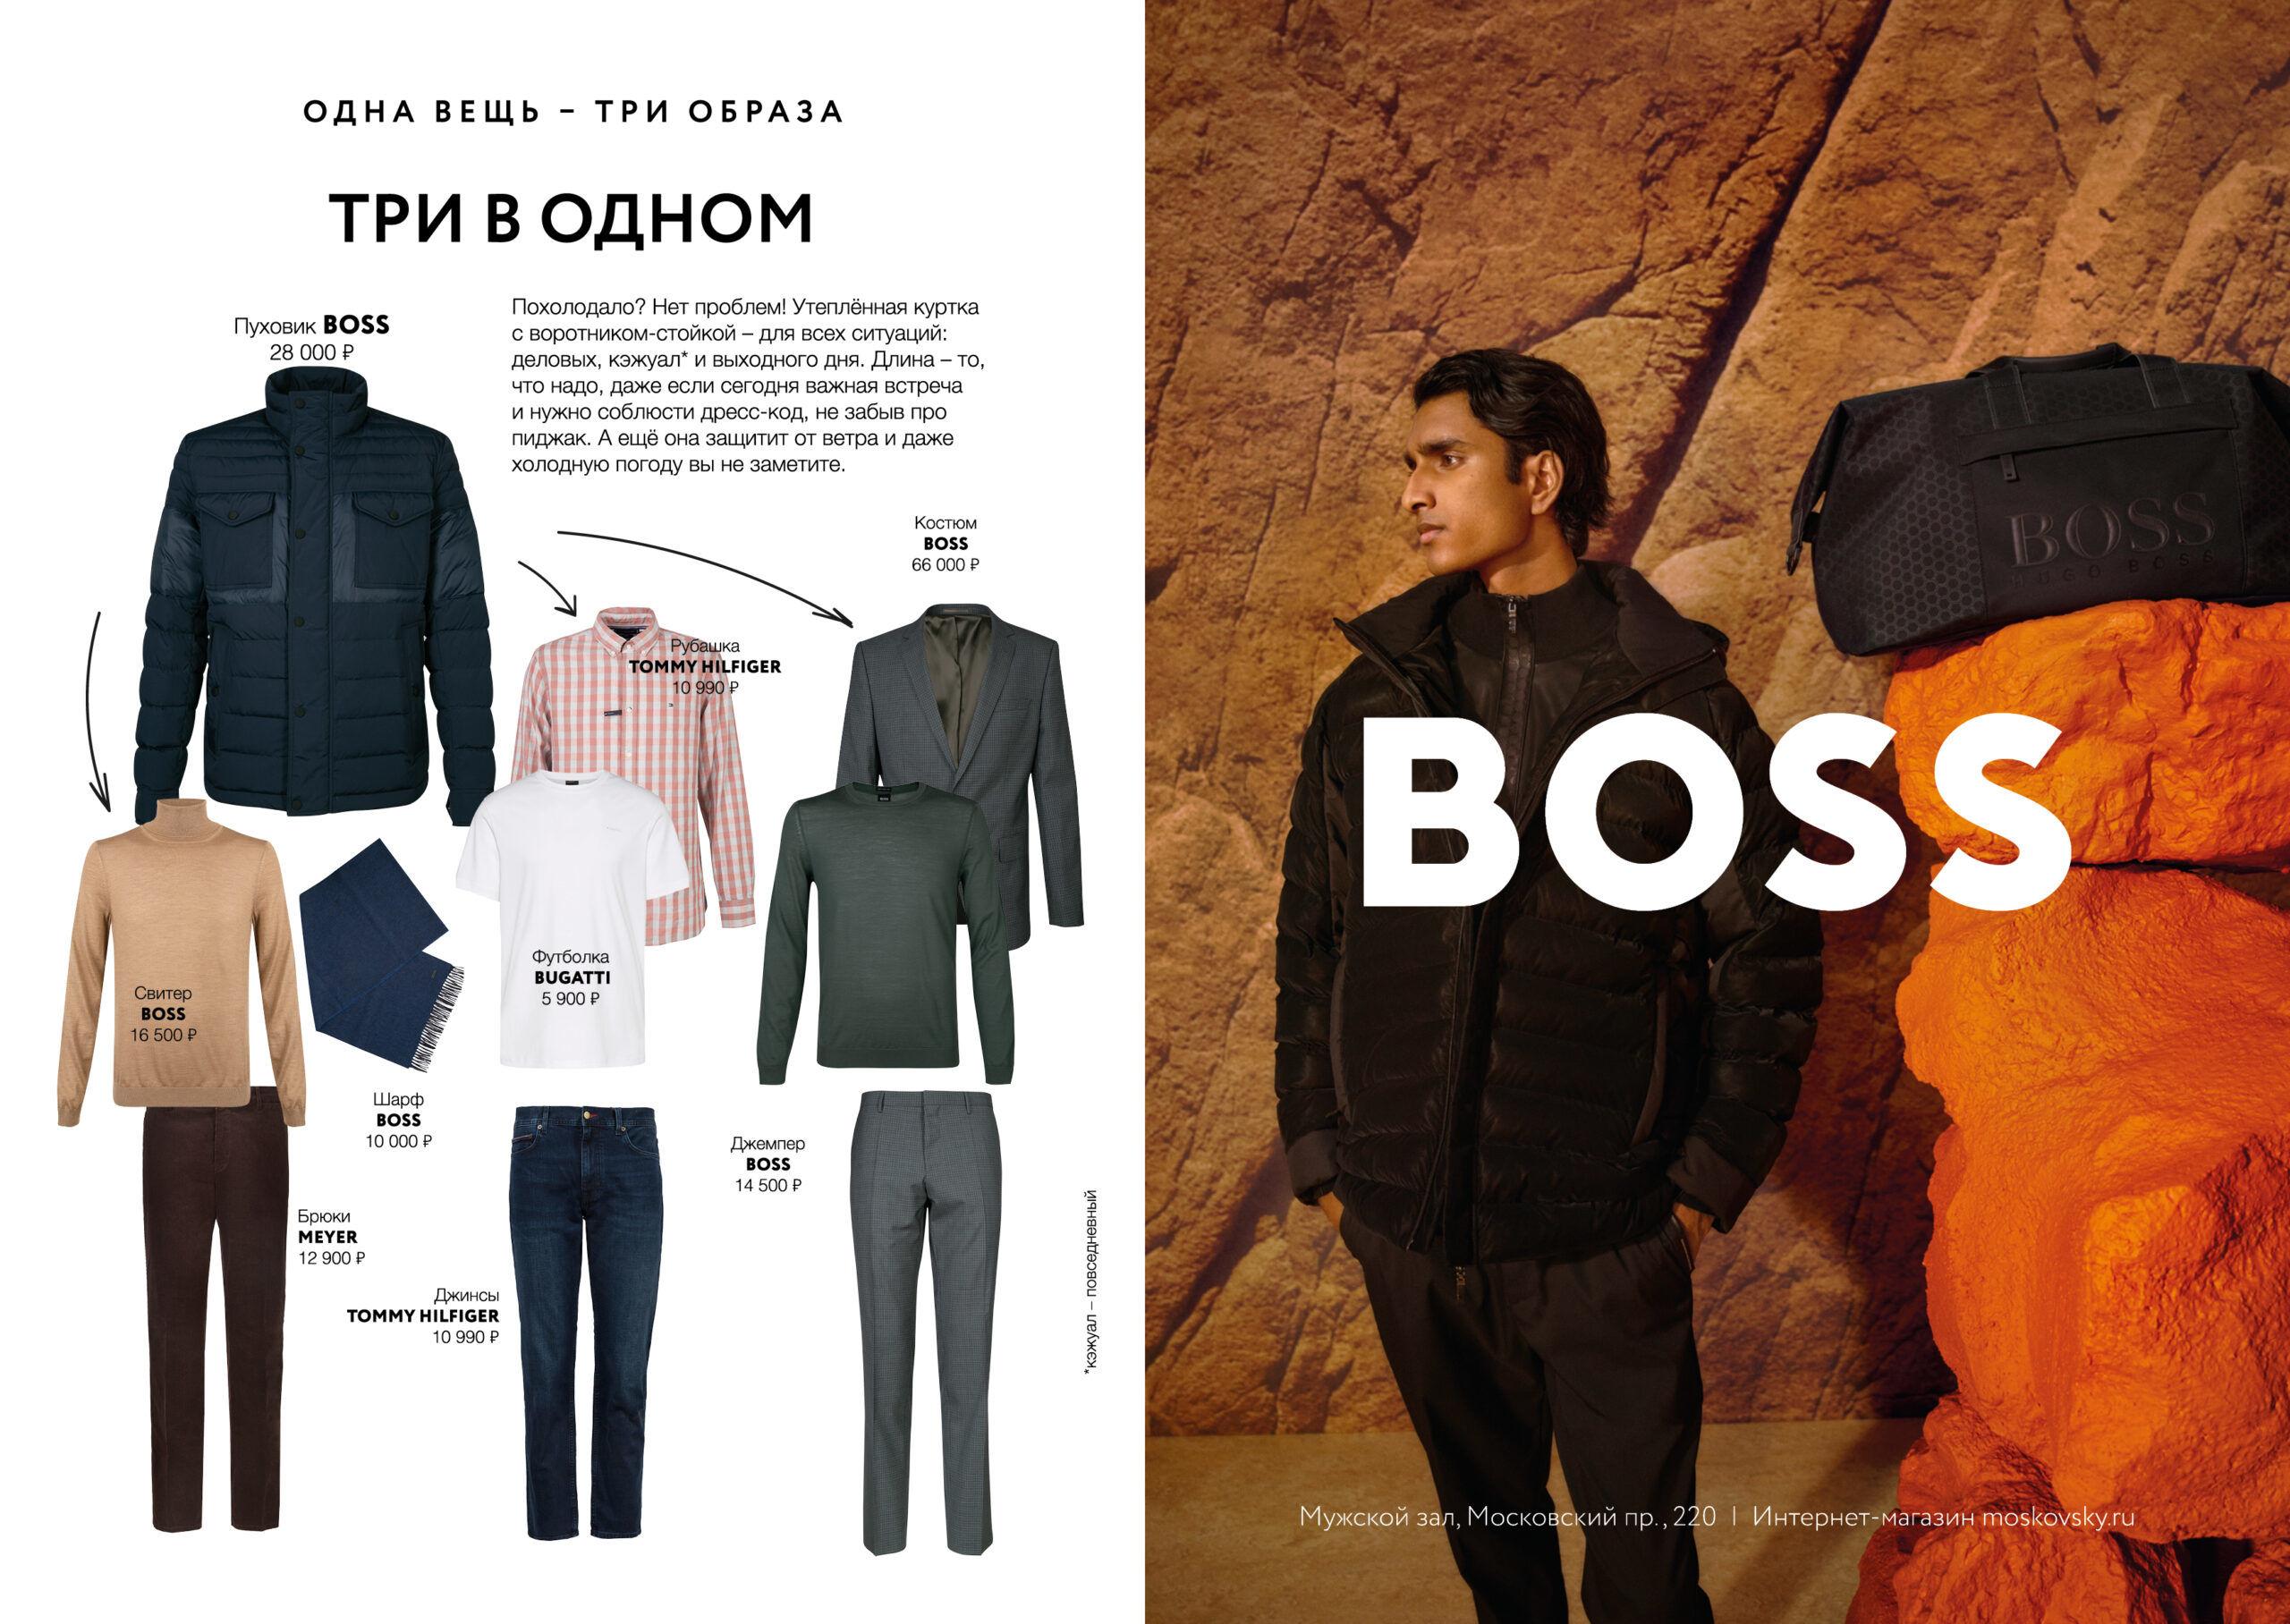 Московский каталог fw21-22_a5_МУЖ4